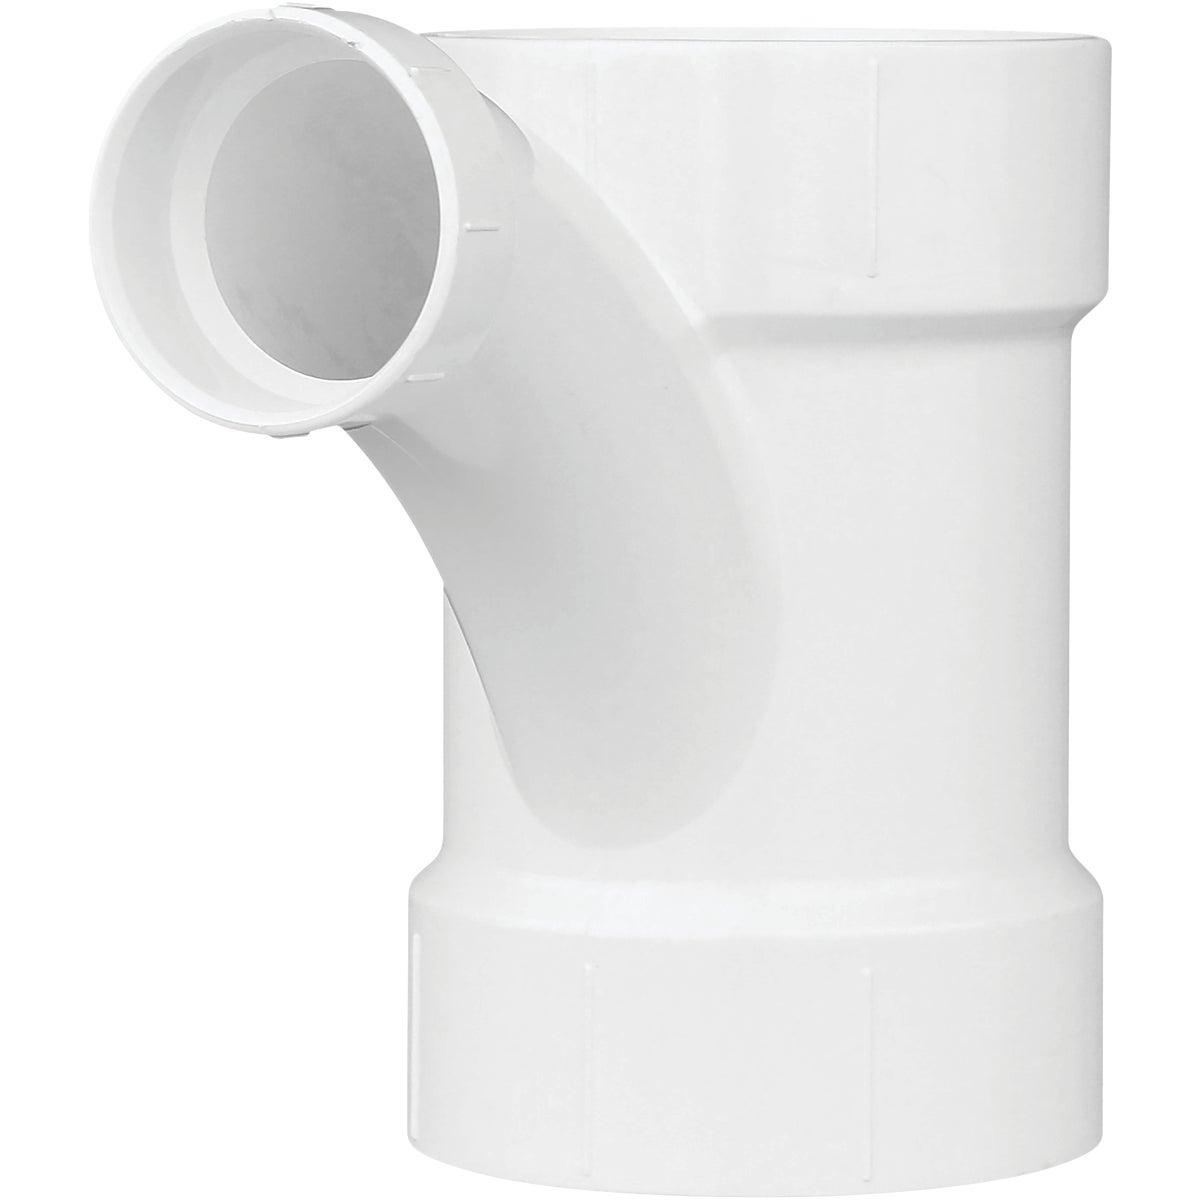 4X4X2 COMBO PVC TEE/WYE - 72542 by Genova Inc  Pvc Dwv